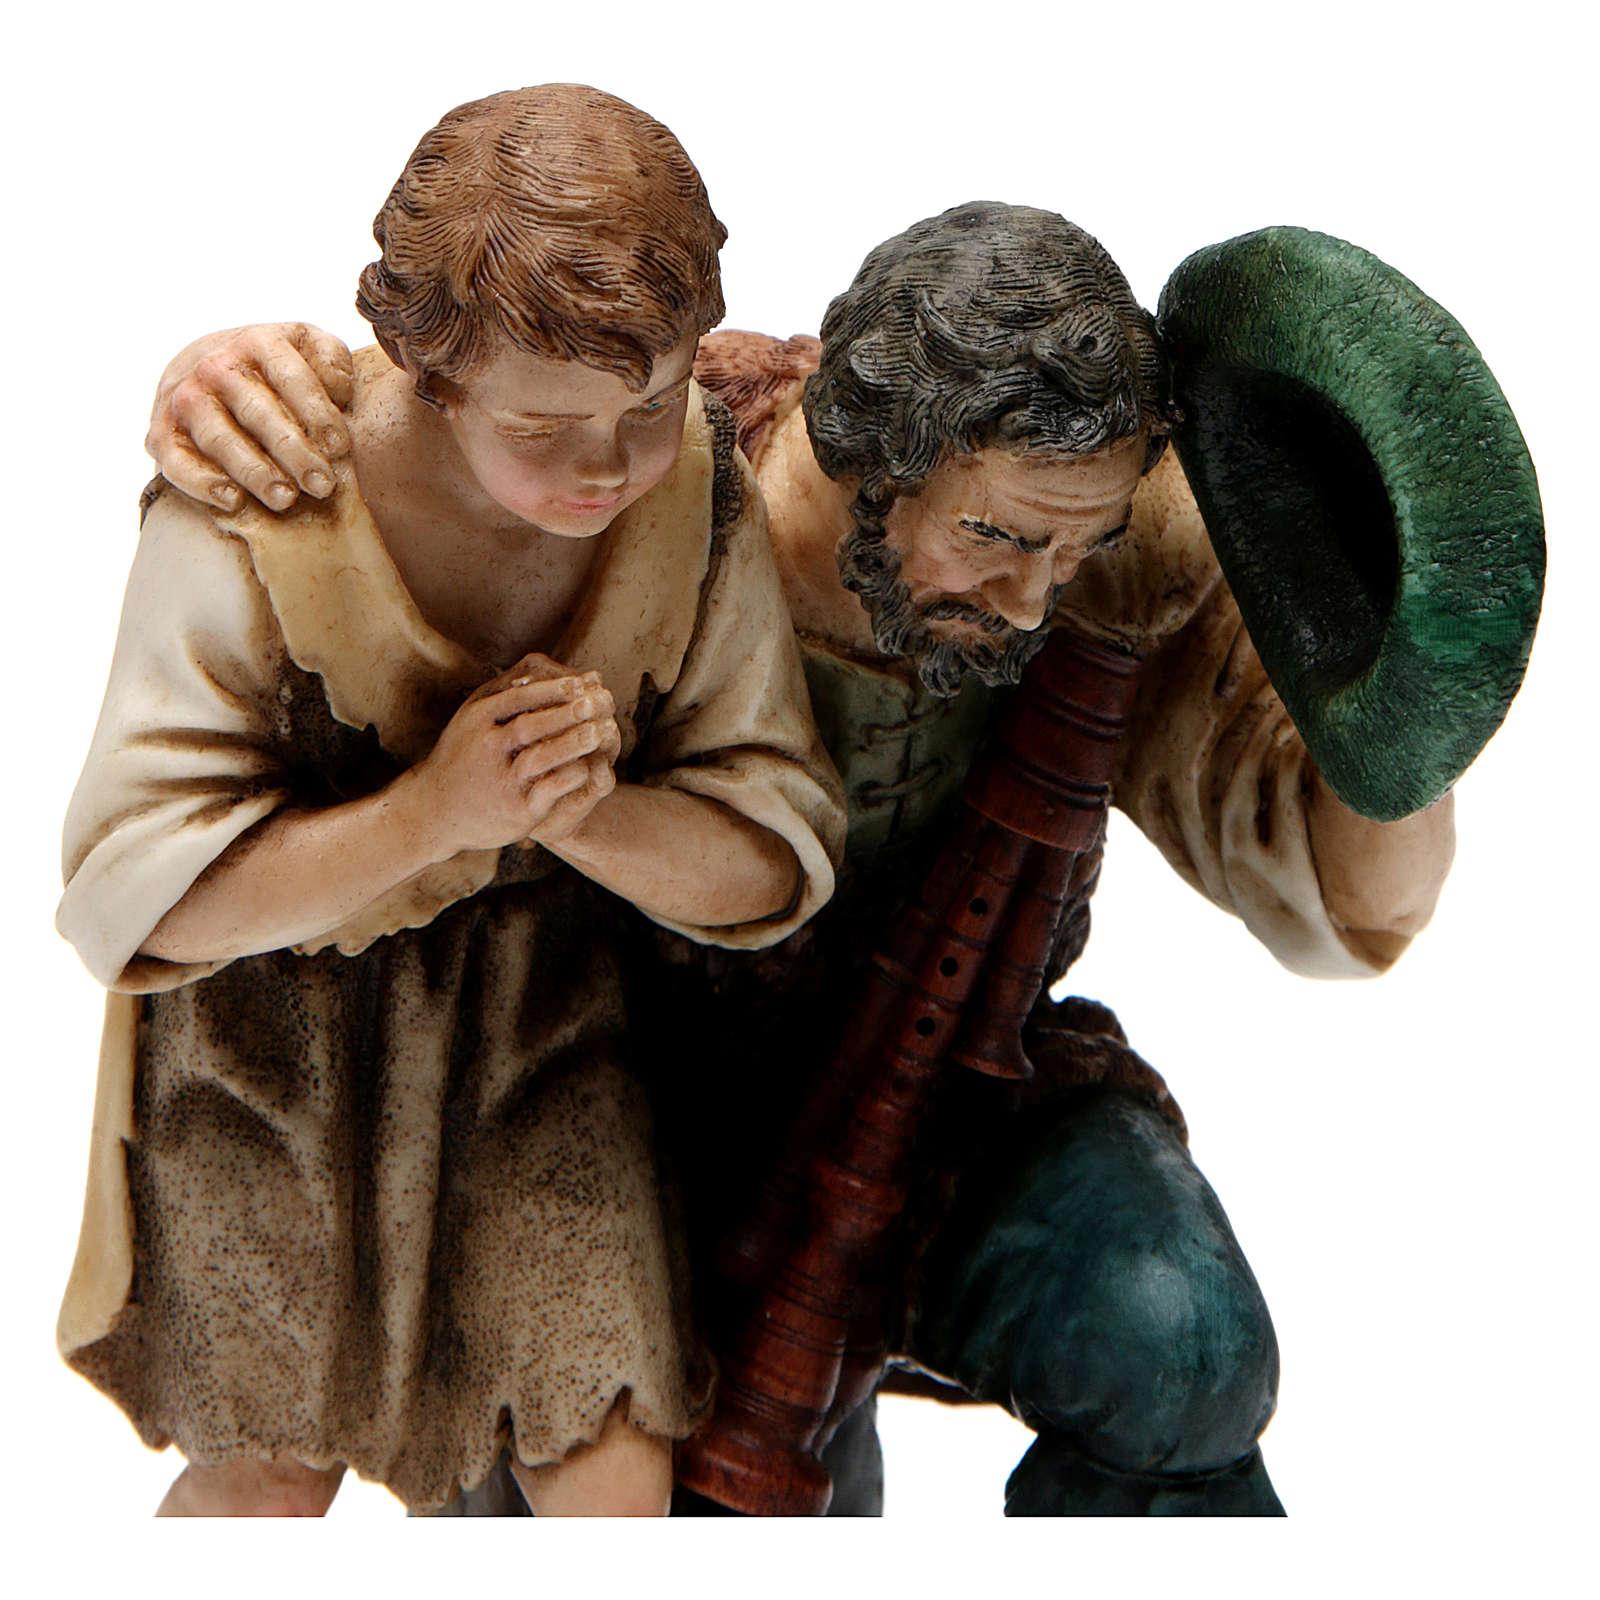 Bagpipe player with child Moranduzzo Nativity Scene 20 cm 4